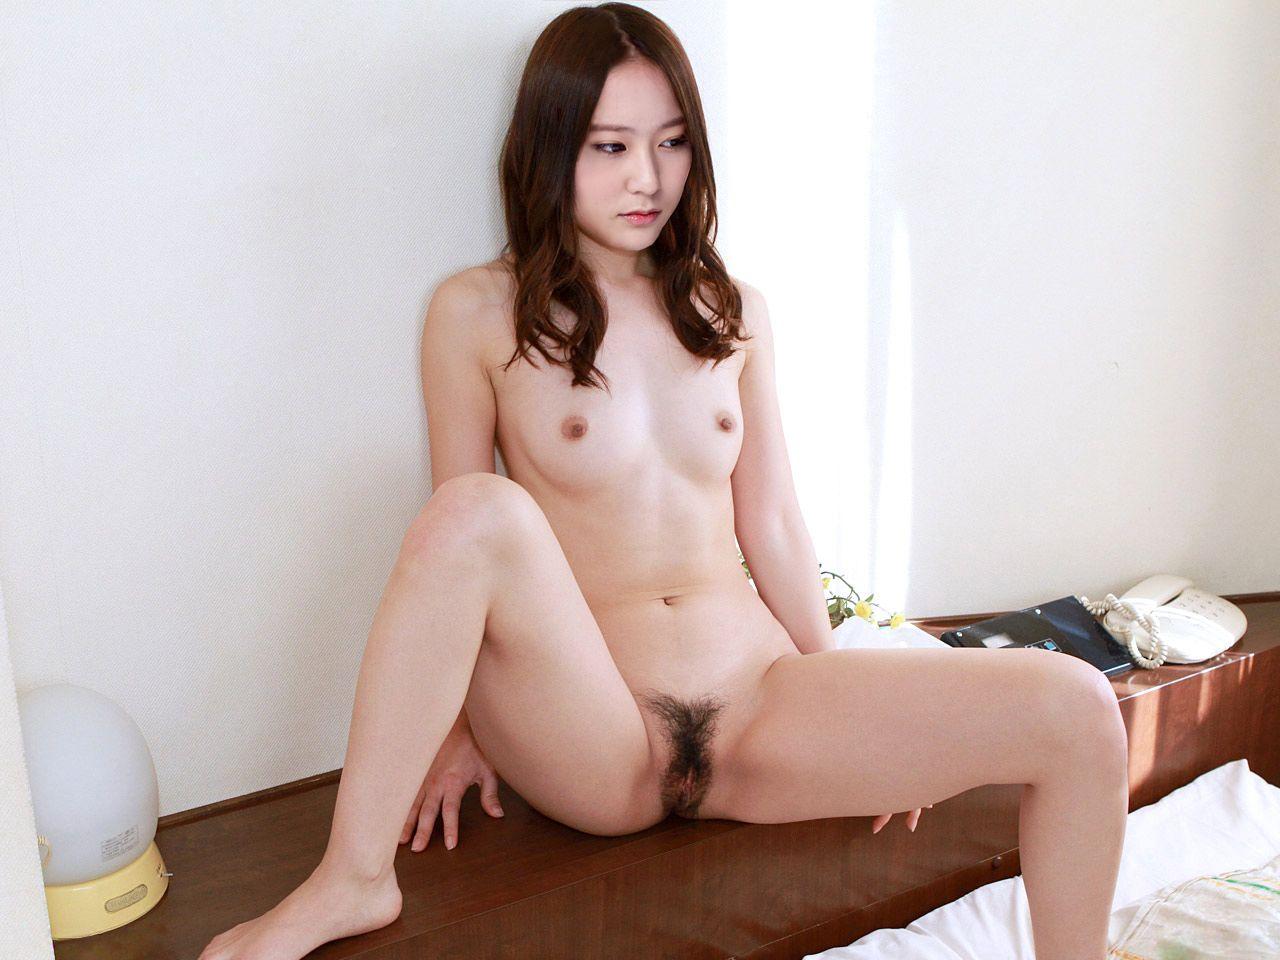 k-pop idol fake nude F(x) - Krystal - Korean Idol Fake Nude Photo